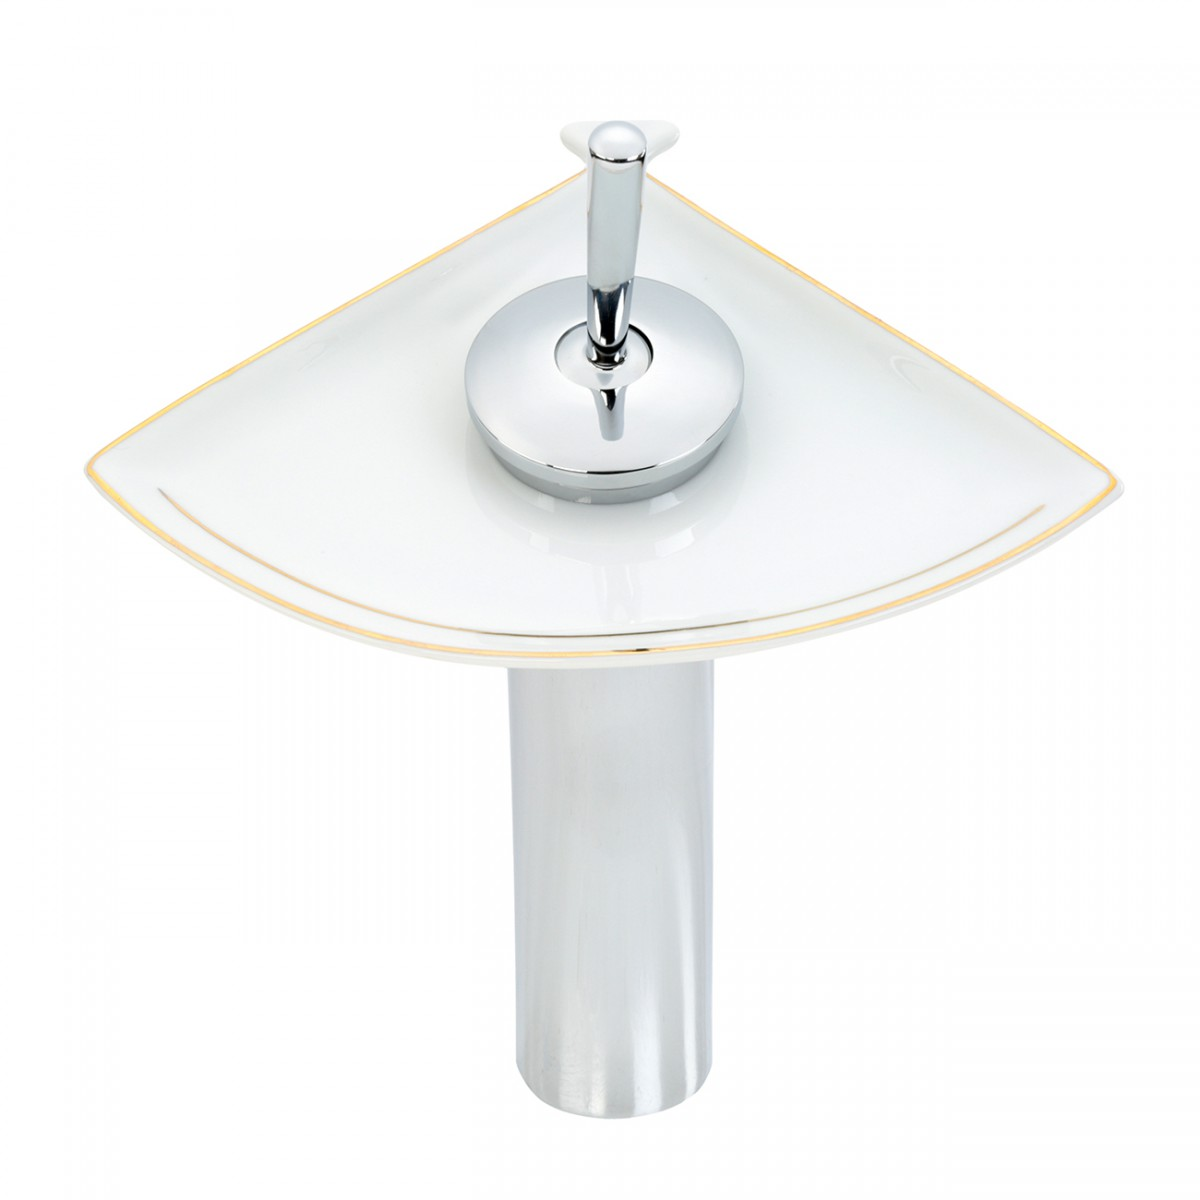 Waterfall Faucet Cast Brass Chrome Tall Ceramic 12 H Glass plate Waterfall Sink Faucet Waterfall Bathroom Faucets Glass Disk Faucet